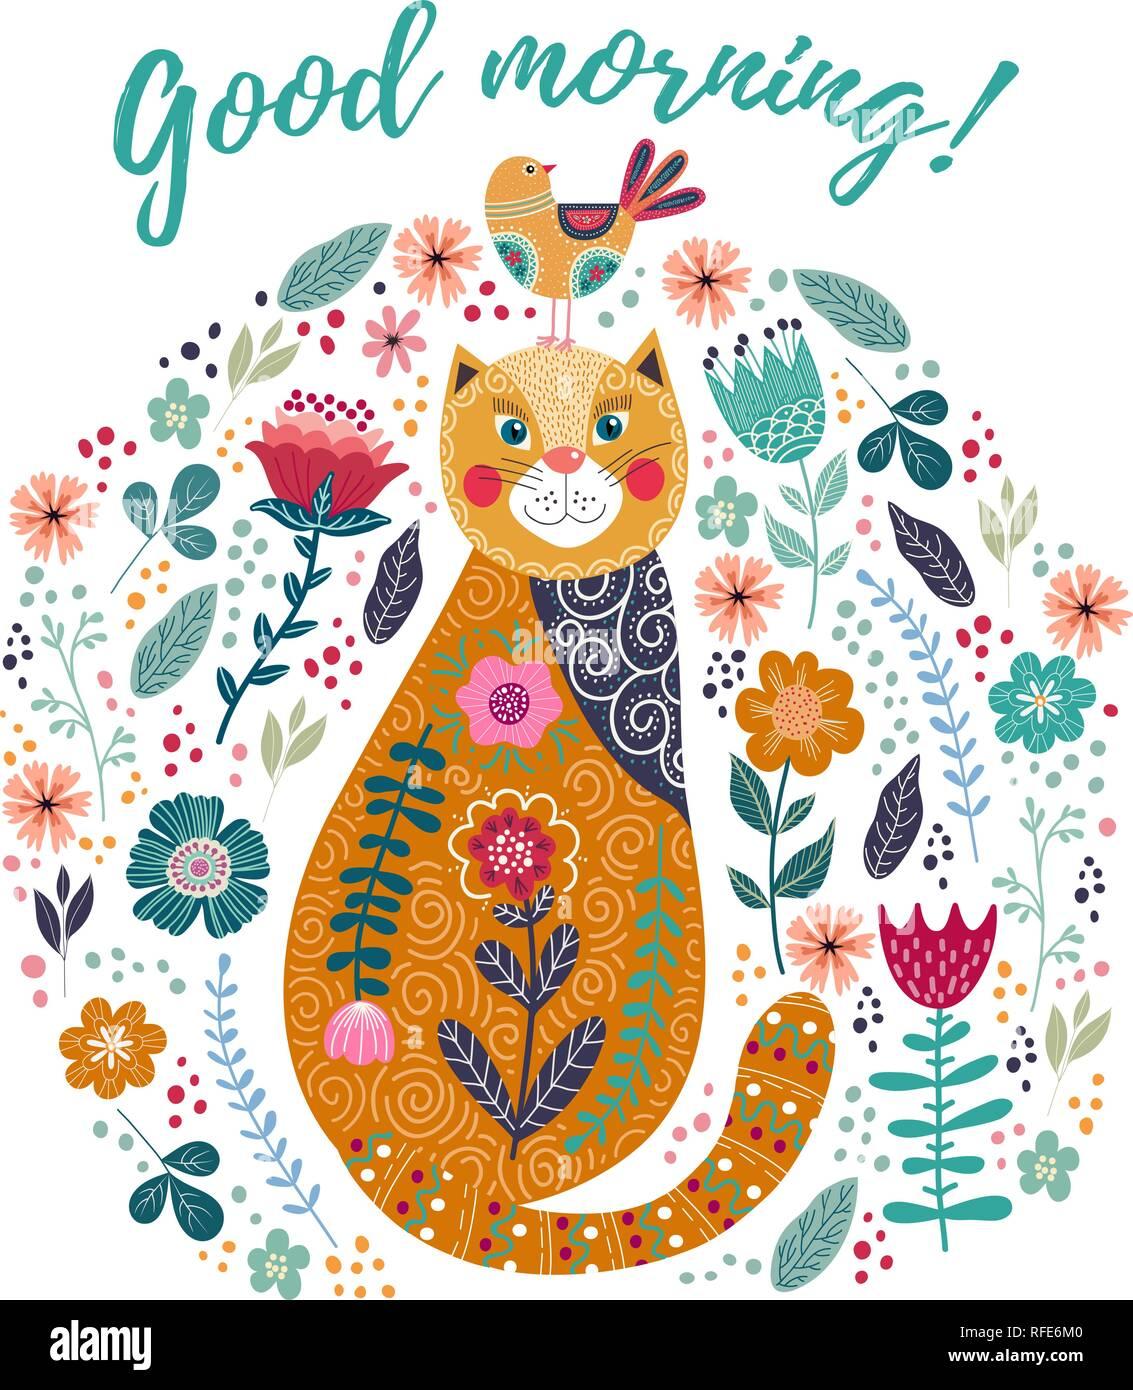 Guten Morgen Kunst Vektor Bunte Illustration Mit Süße Katze